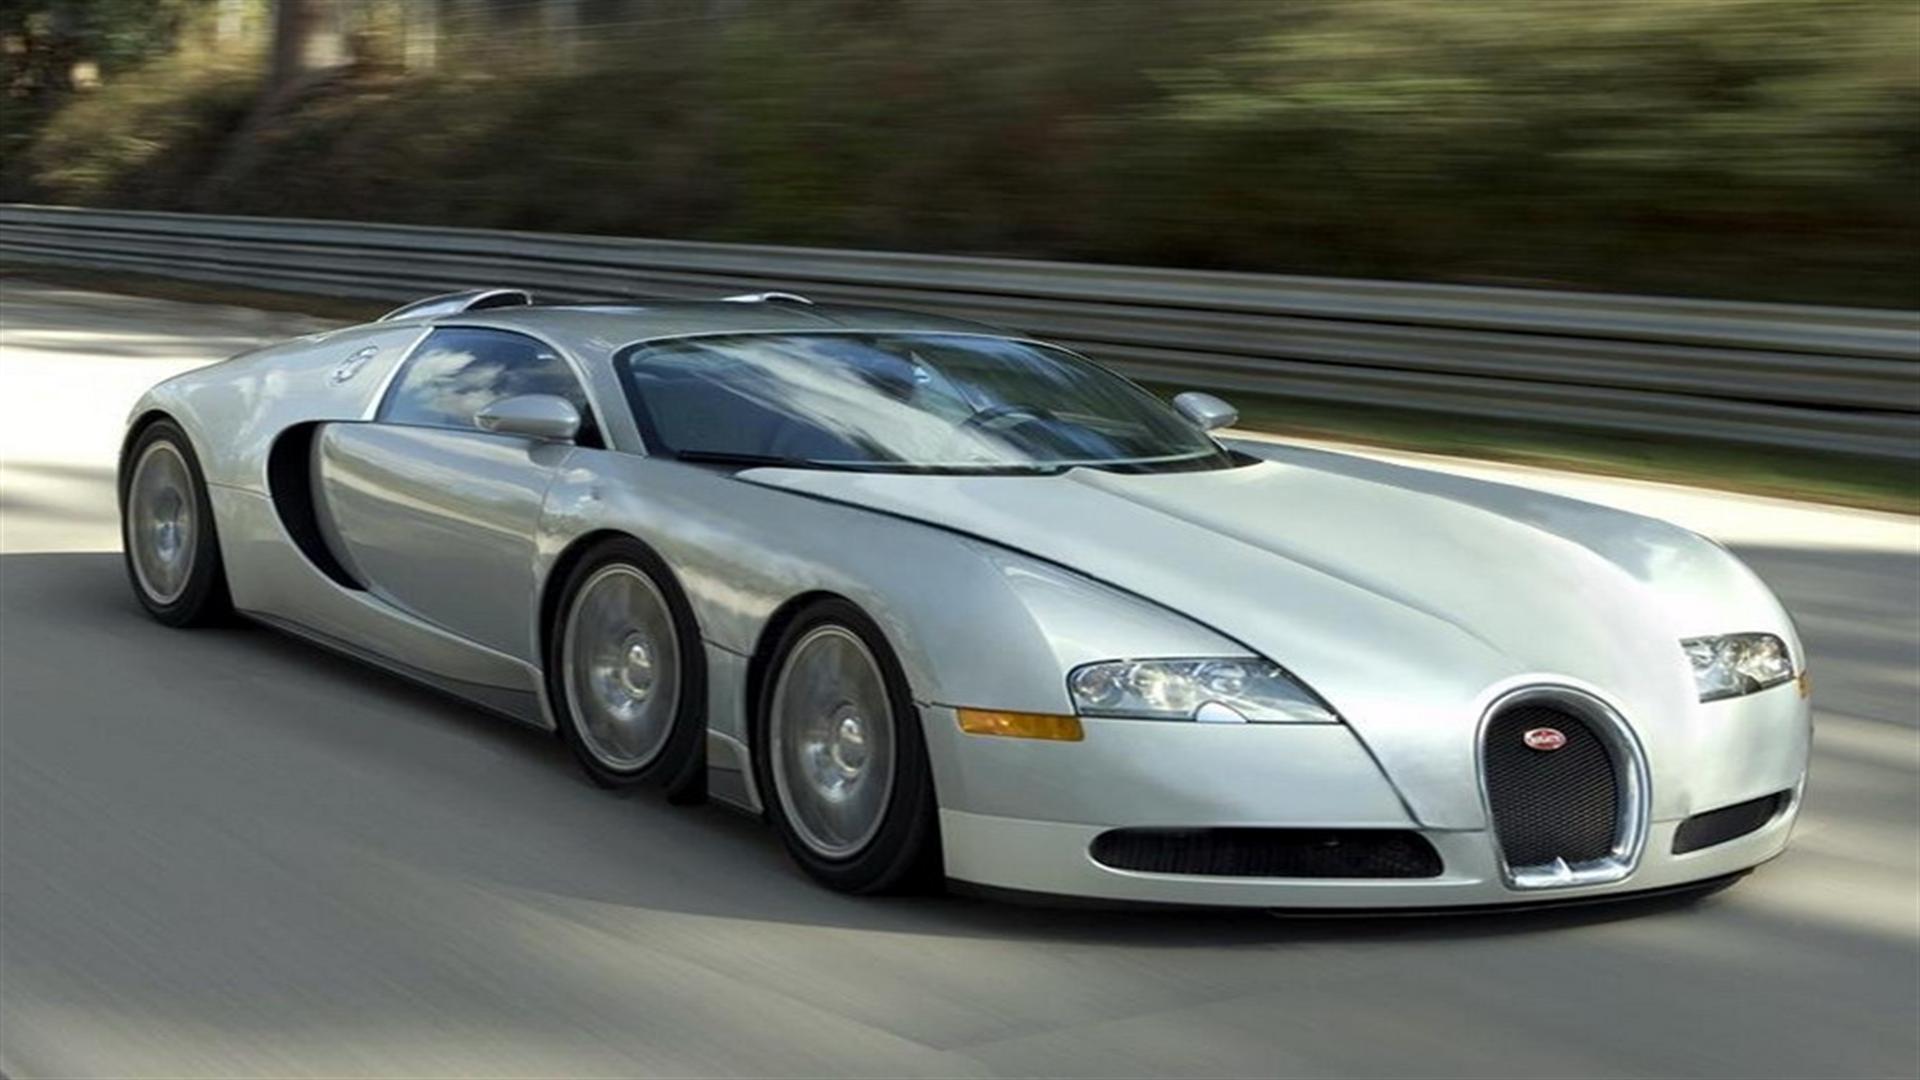 Bugatti Veyron Wallpaper 1080p Wallpapersafari